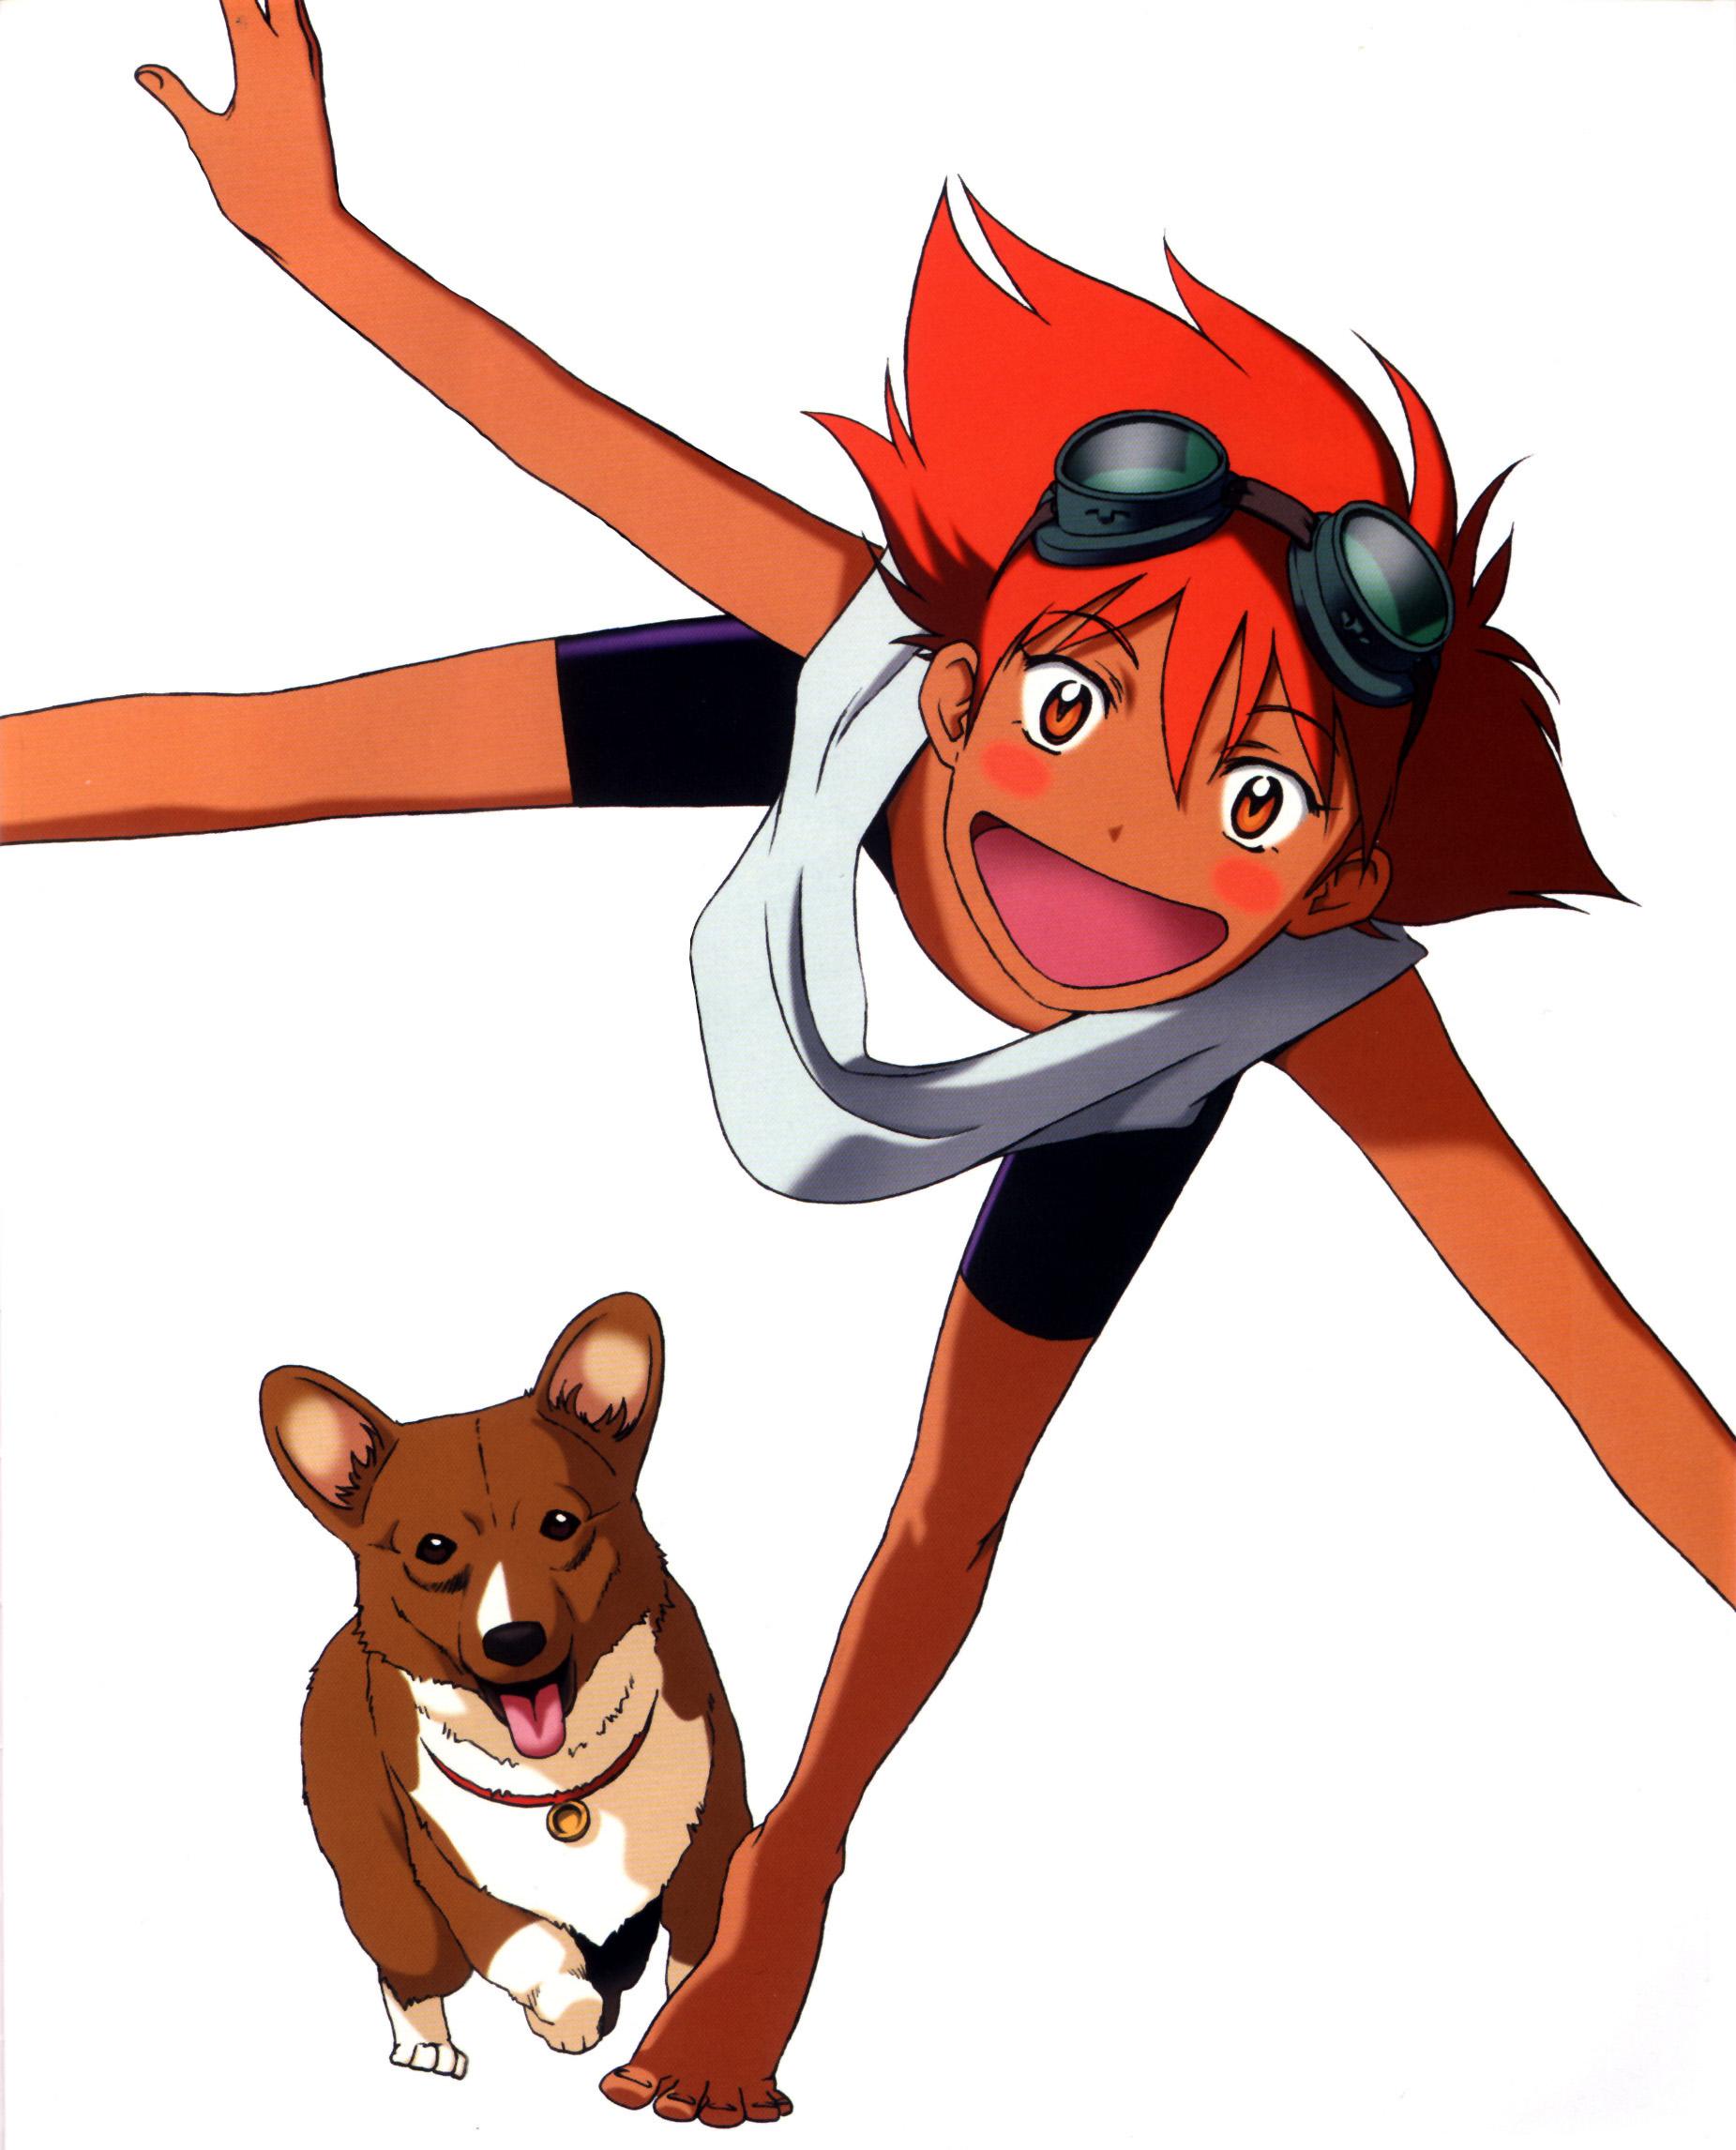 Red haired Radical Edward and her corgi Ein play around.